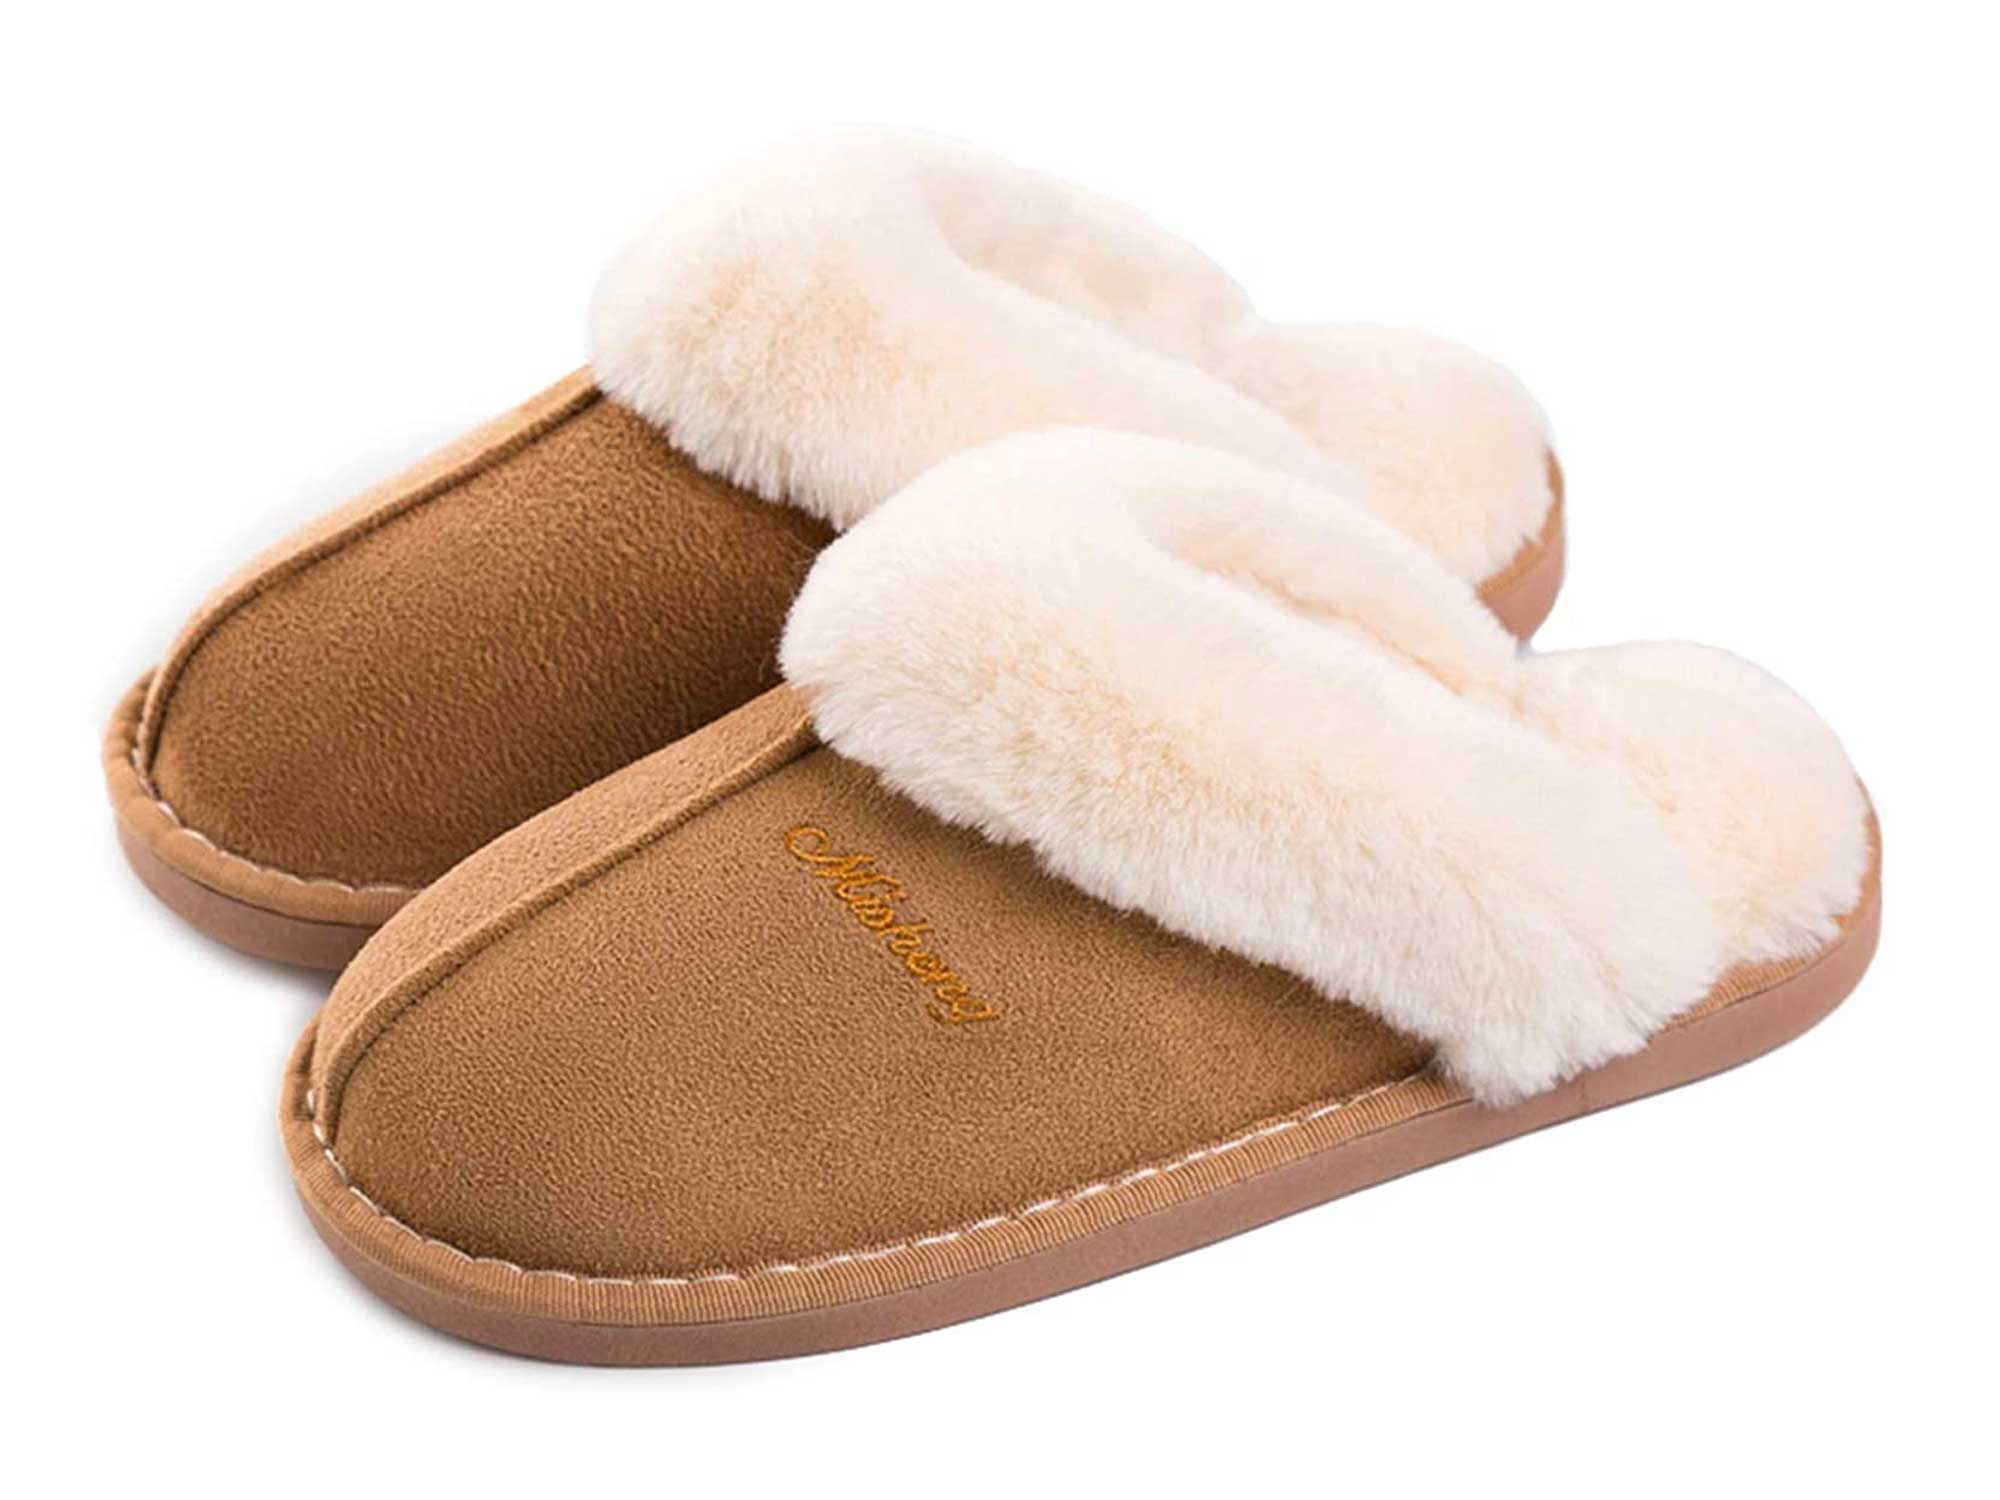 Women Men Fur Slippers Memory Foam Fluffy Slip-on House Suede Lined/Anti-Skid Sole, Indoor & Outdoor